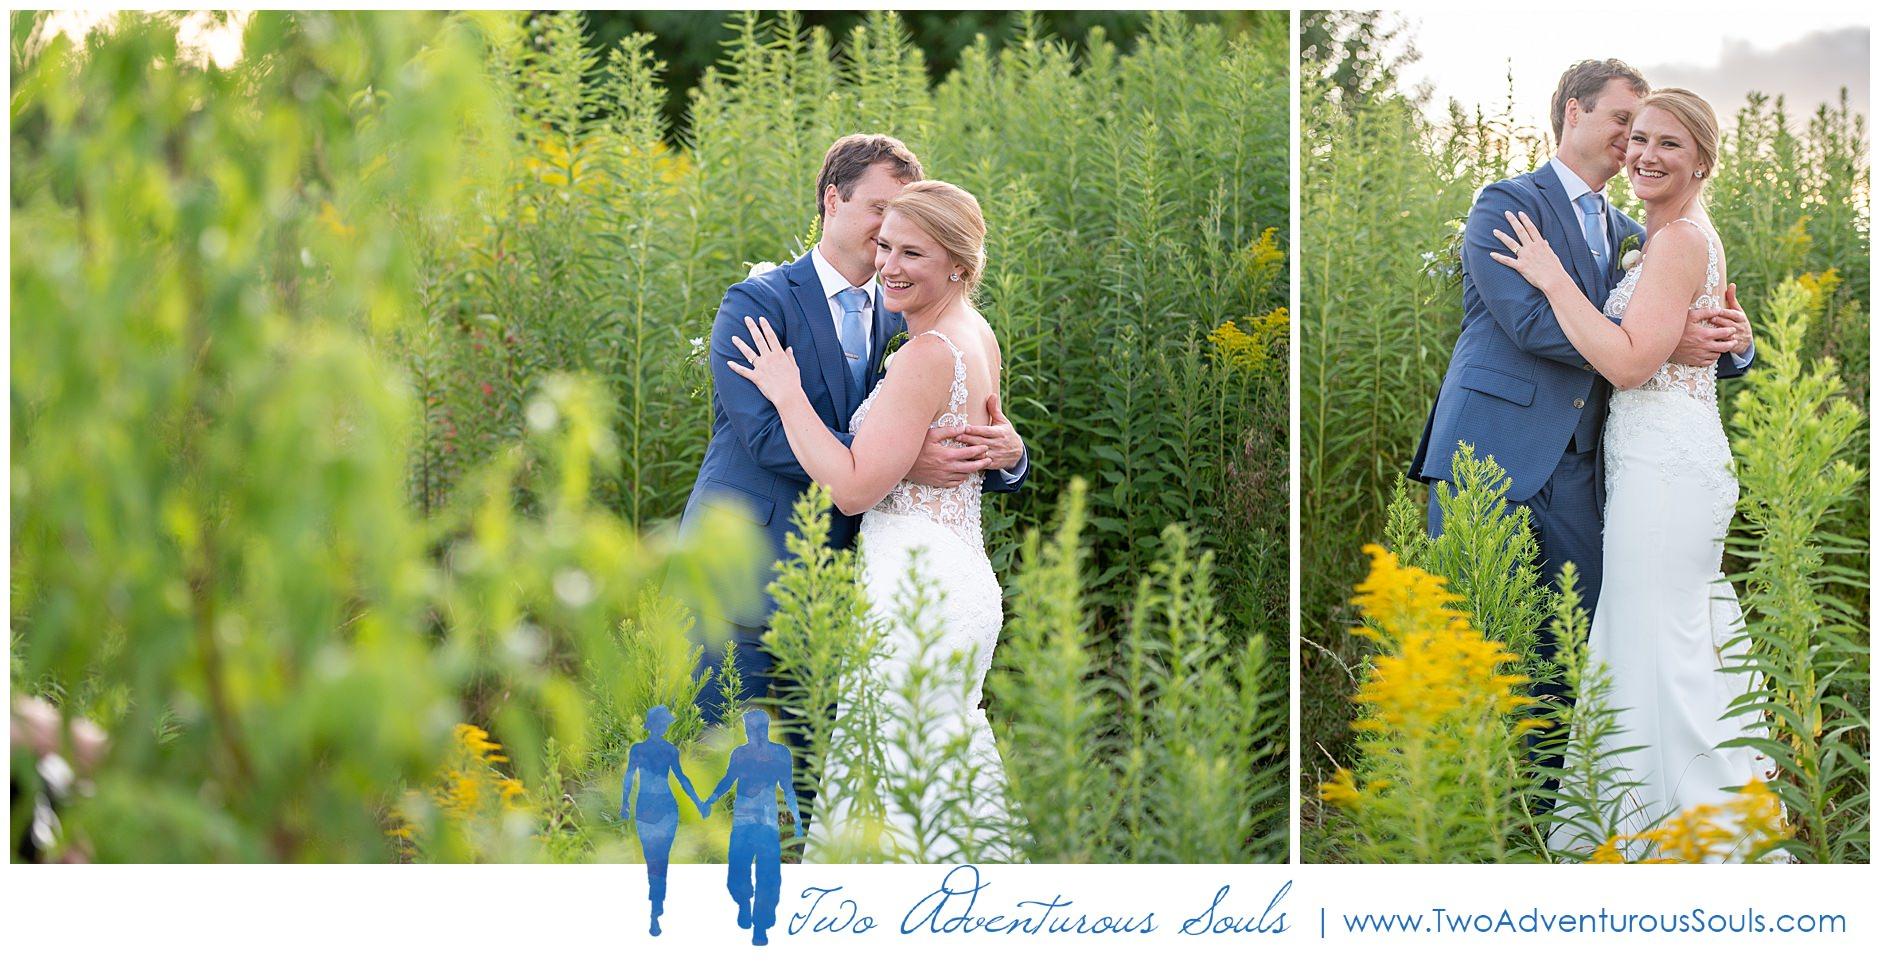 Maine Wedding Photographers, Point Lookout Wedding Photographers, Maine Elopement Photographers, Two Adventurous Souls-0080419_0059.jpg